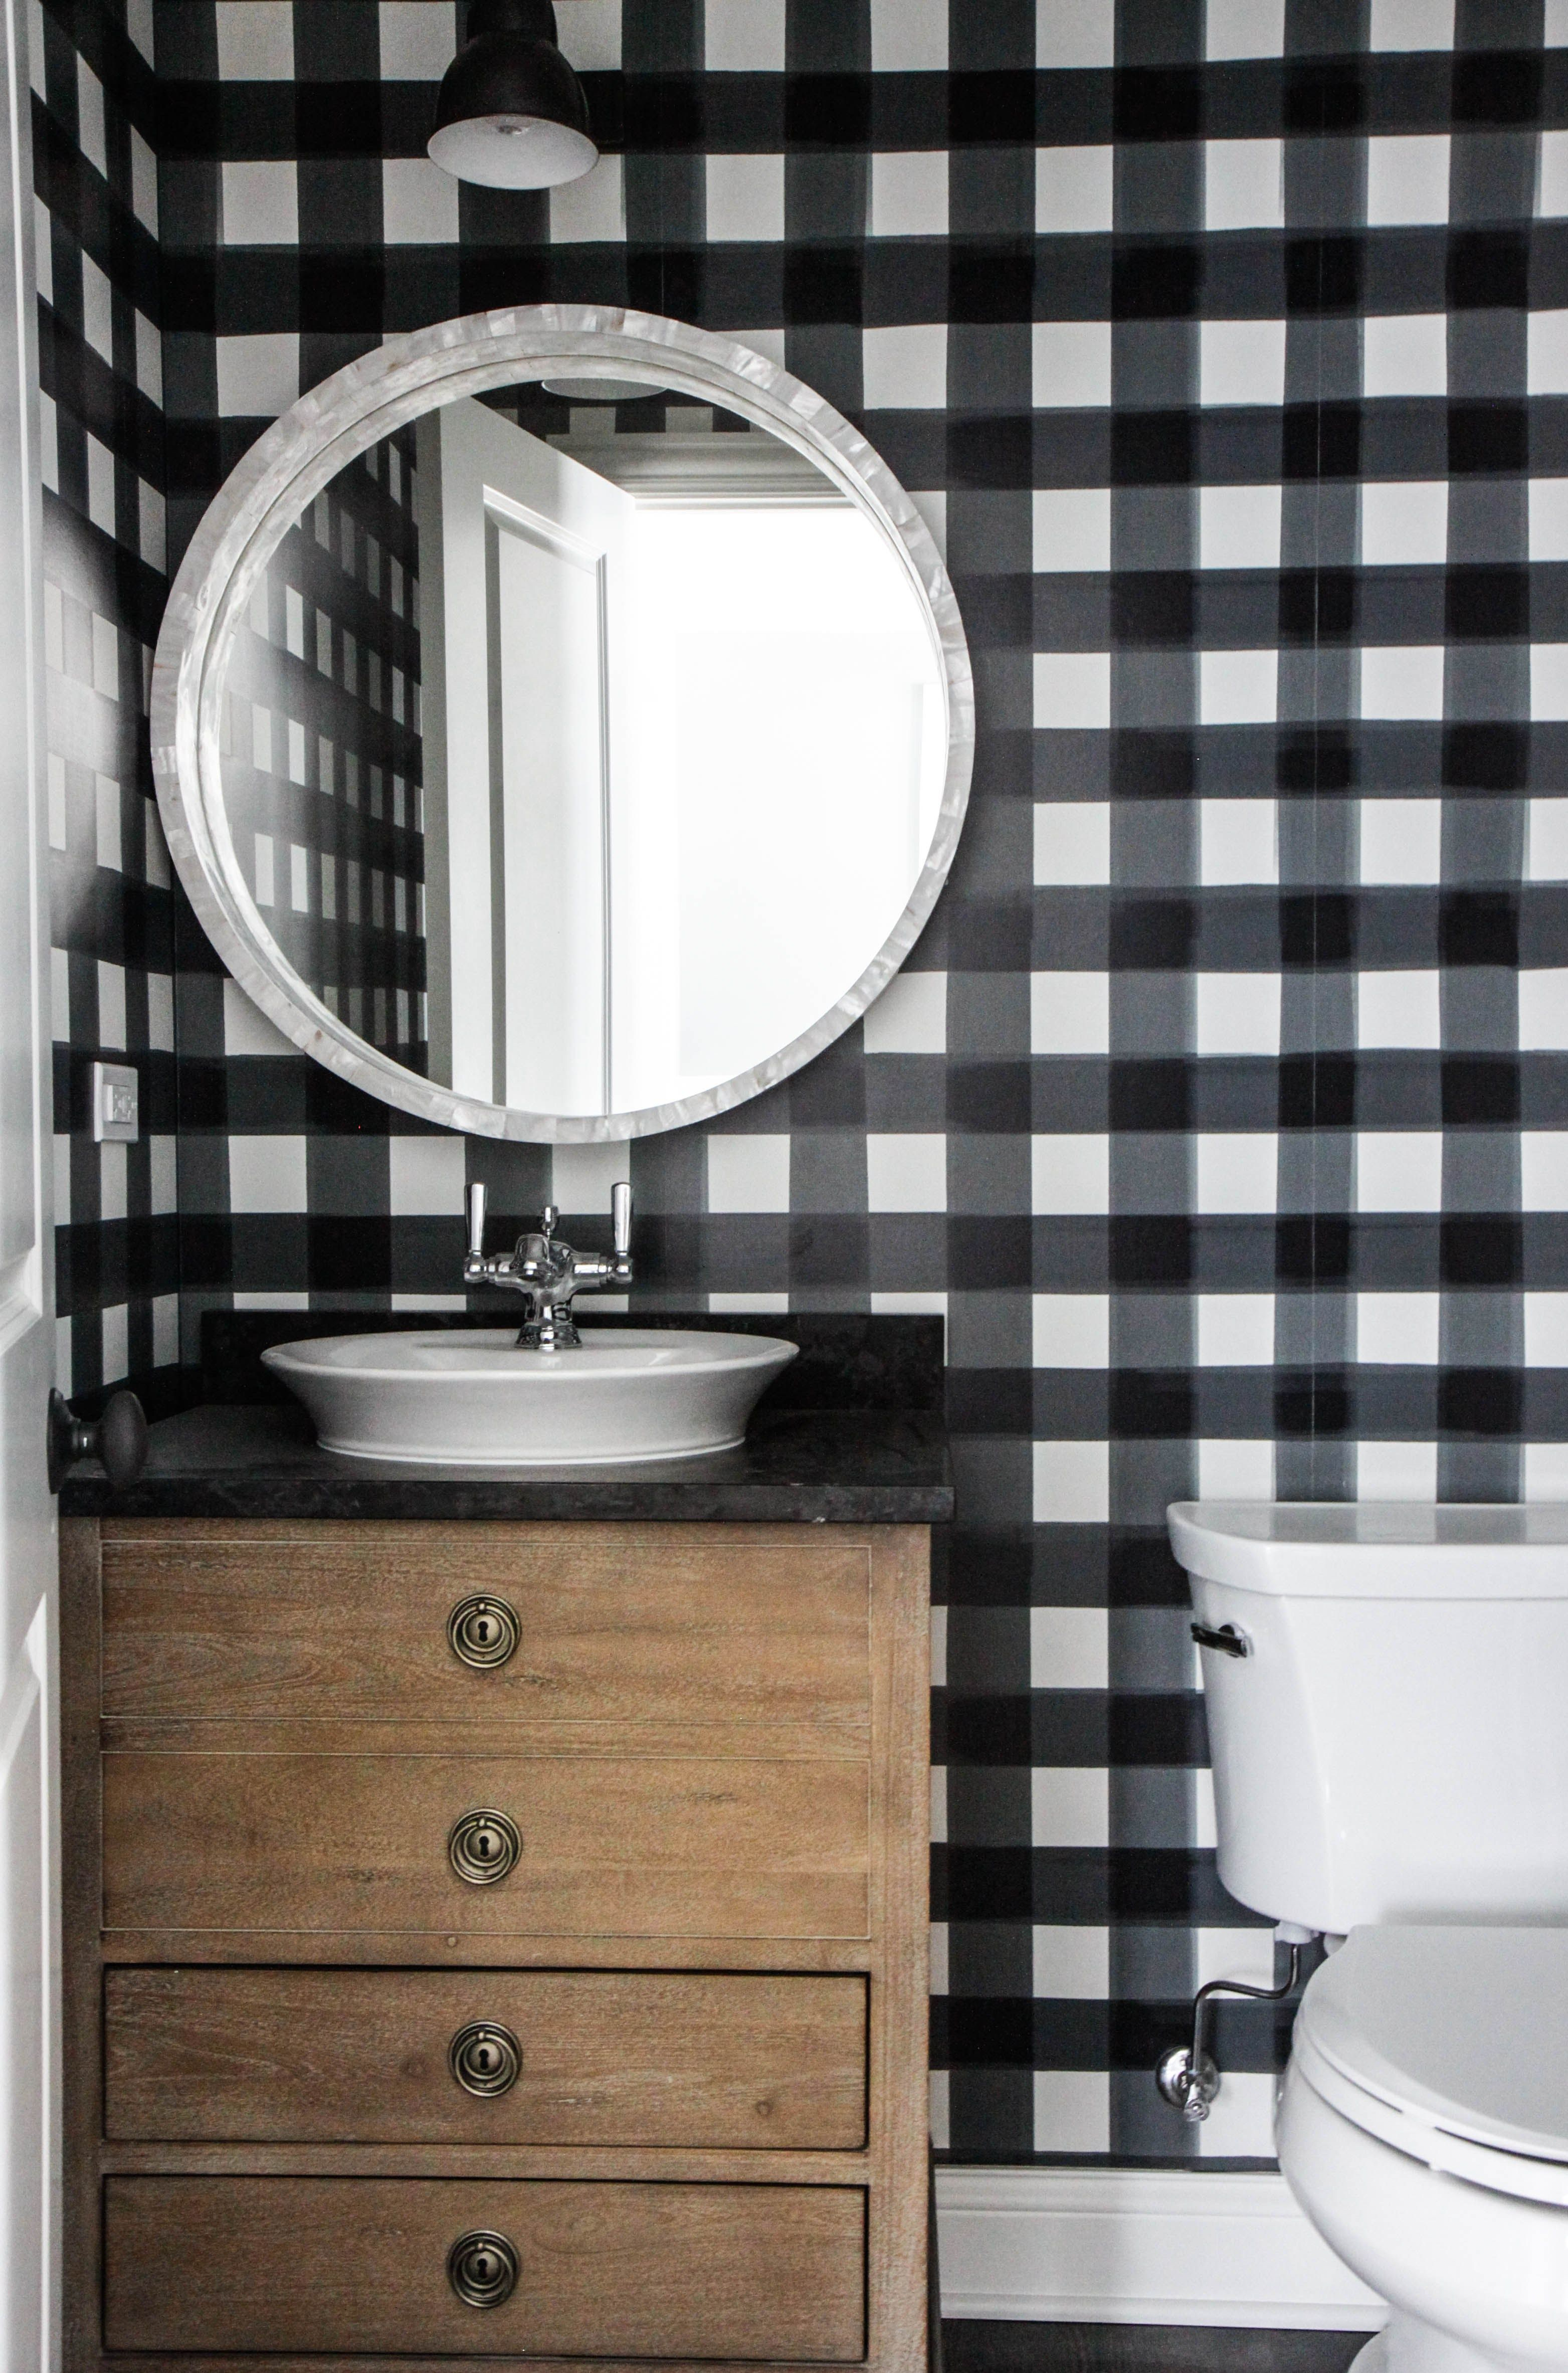 Powder Room Reveal Park And Oak Interior Design Powder Room Small Bathroom Decor Industrial Style Bathroom